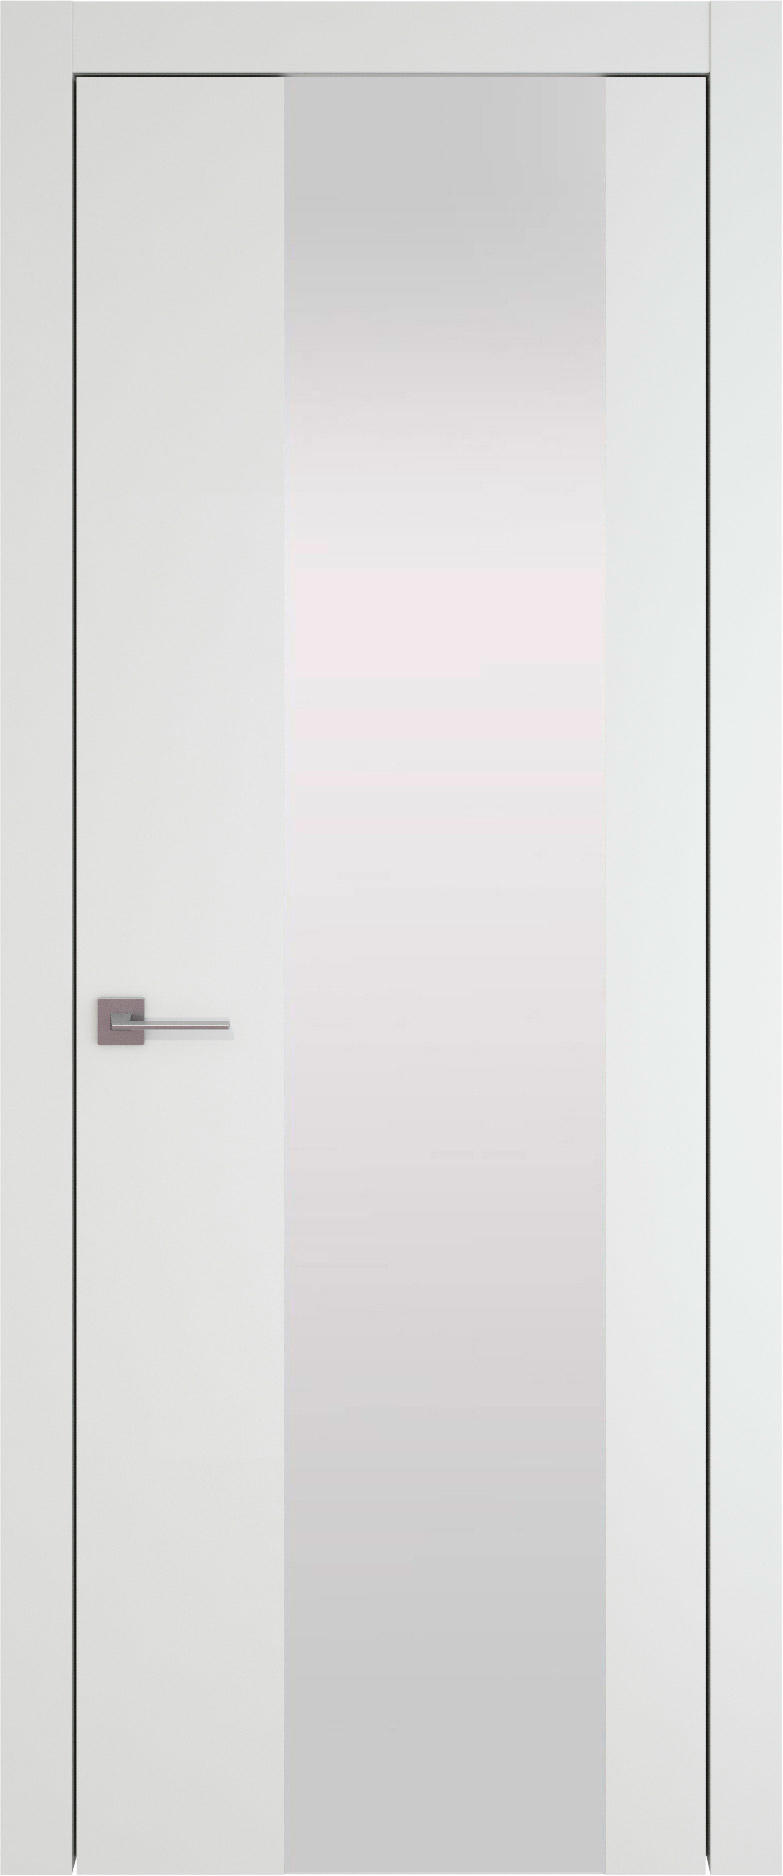 Tivoli Е-1 цвет - Белая эмаль (RAL 9003) Со стеклом (ДО)